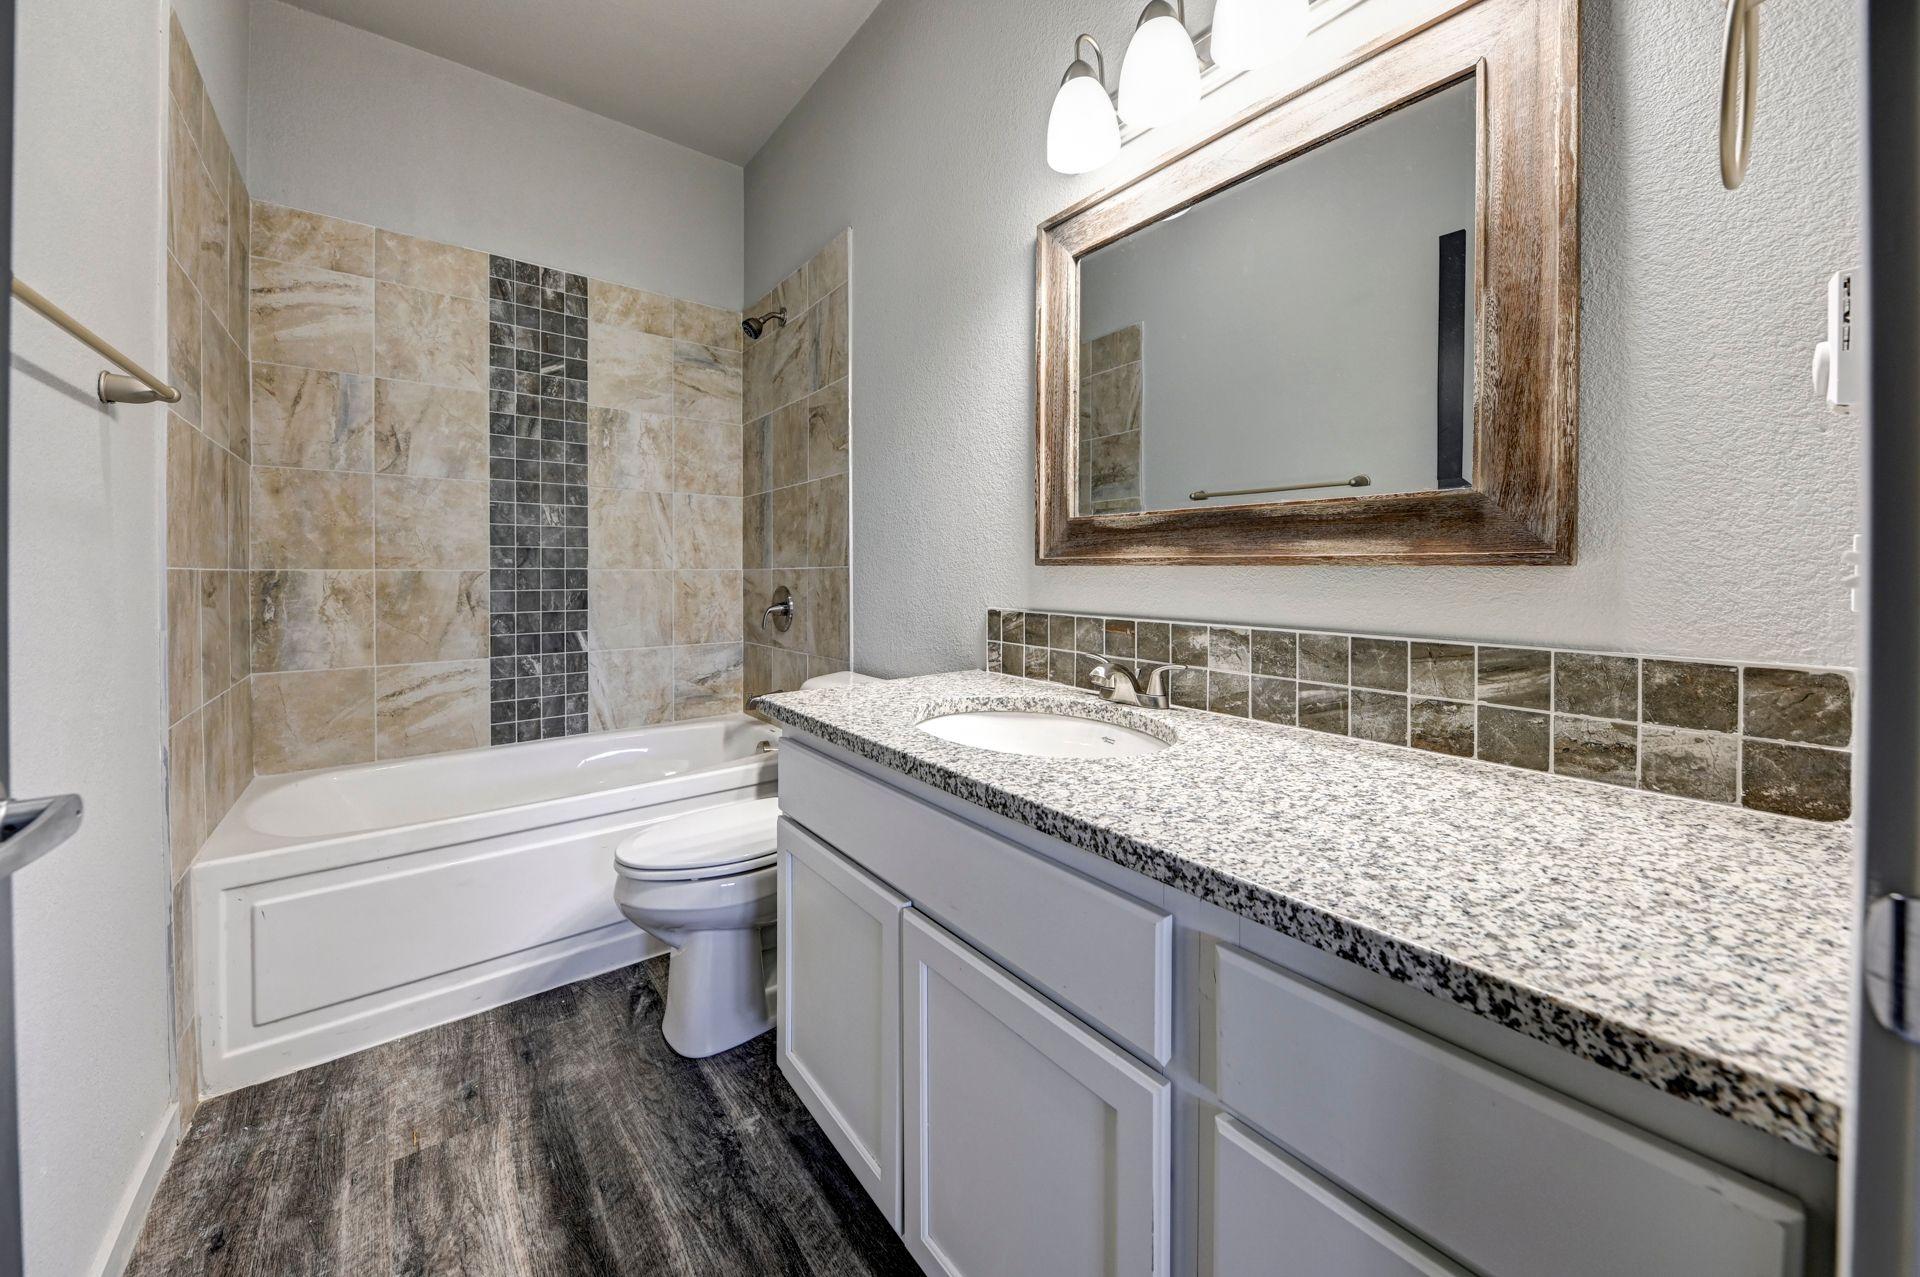 Bathroom featured in the Juniper By Westover Homes in Colorado Springs, CO